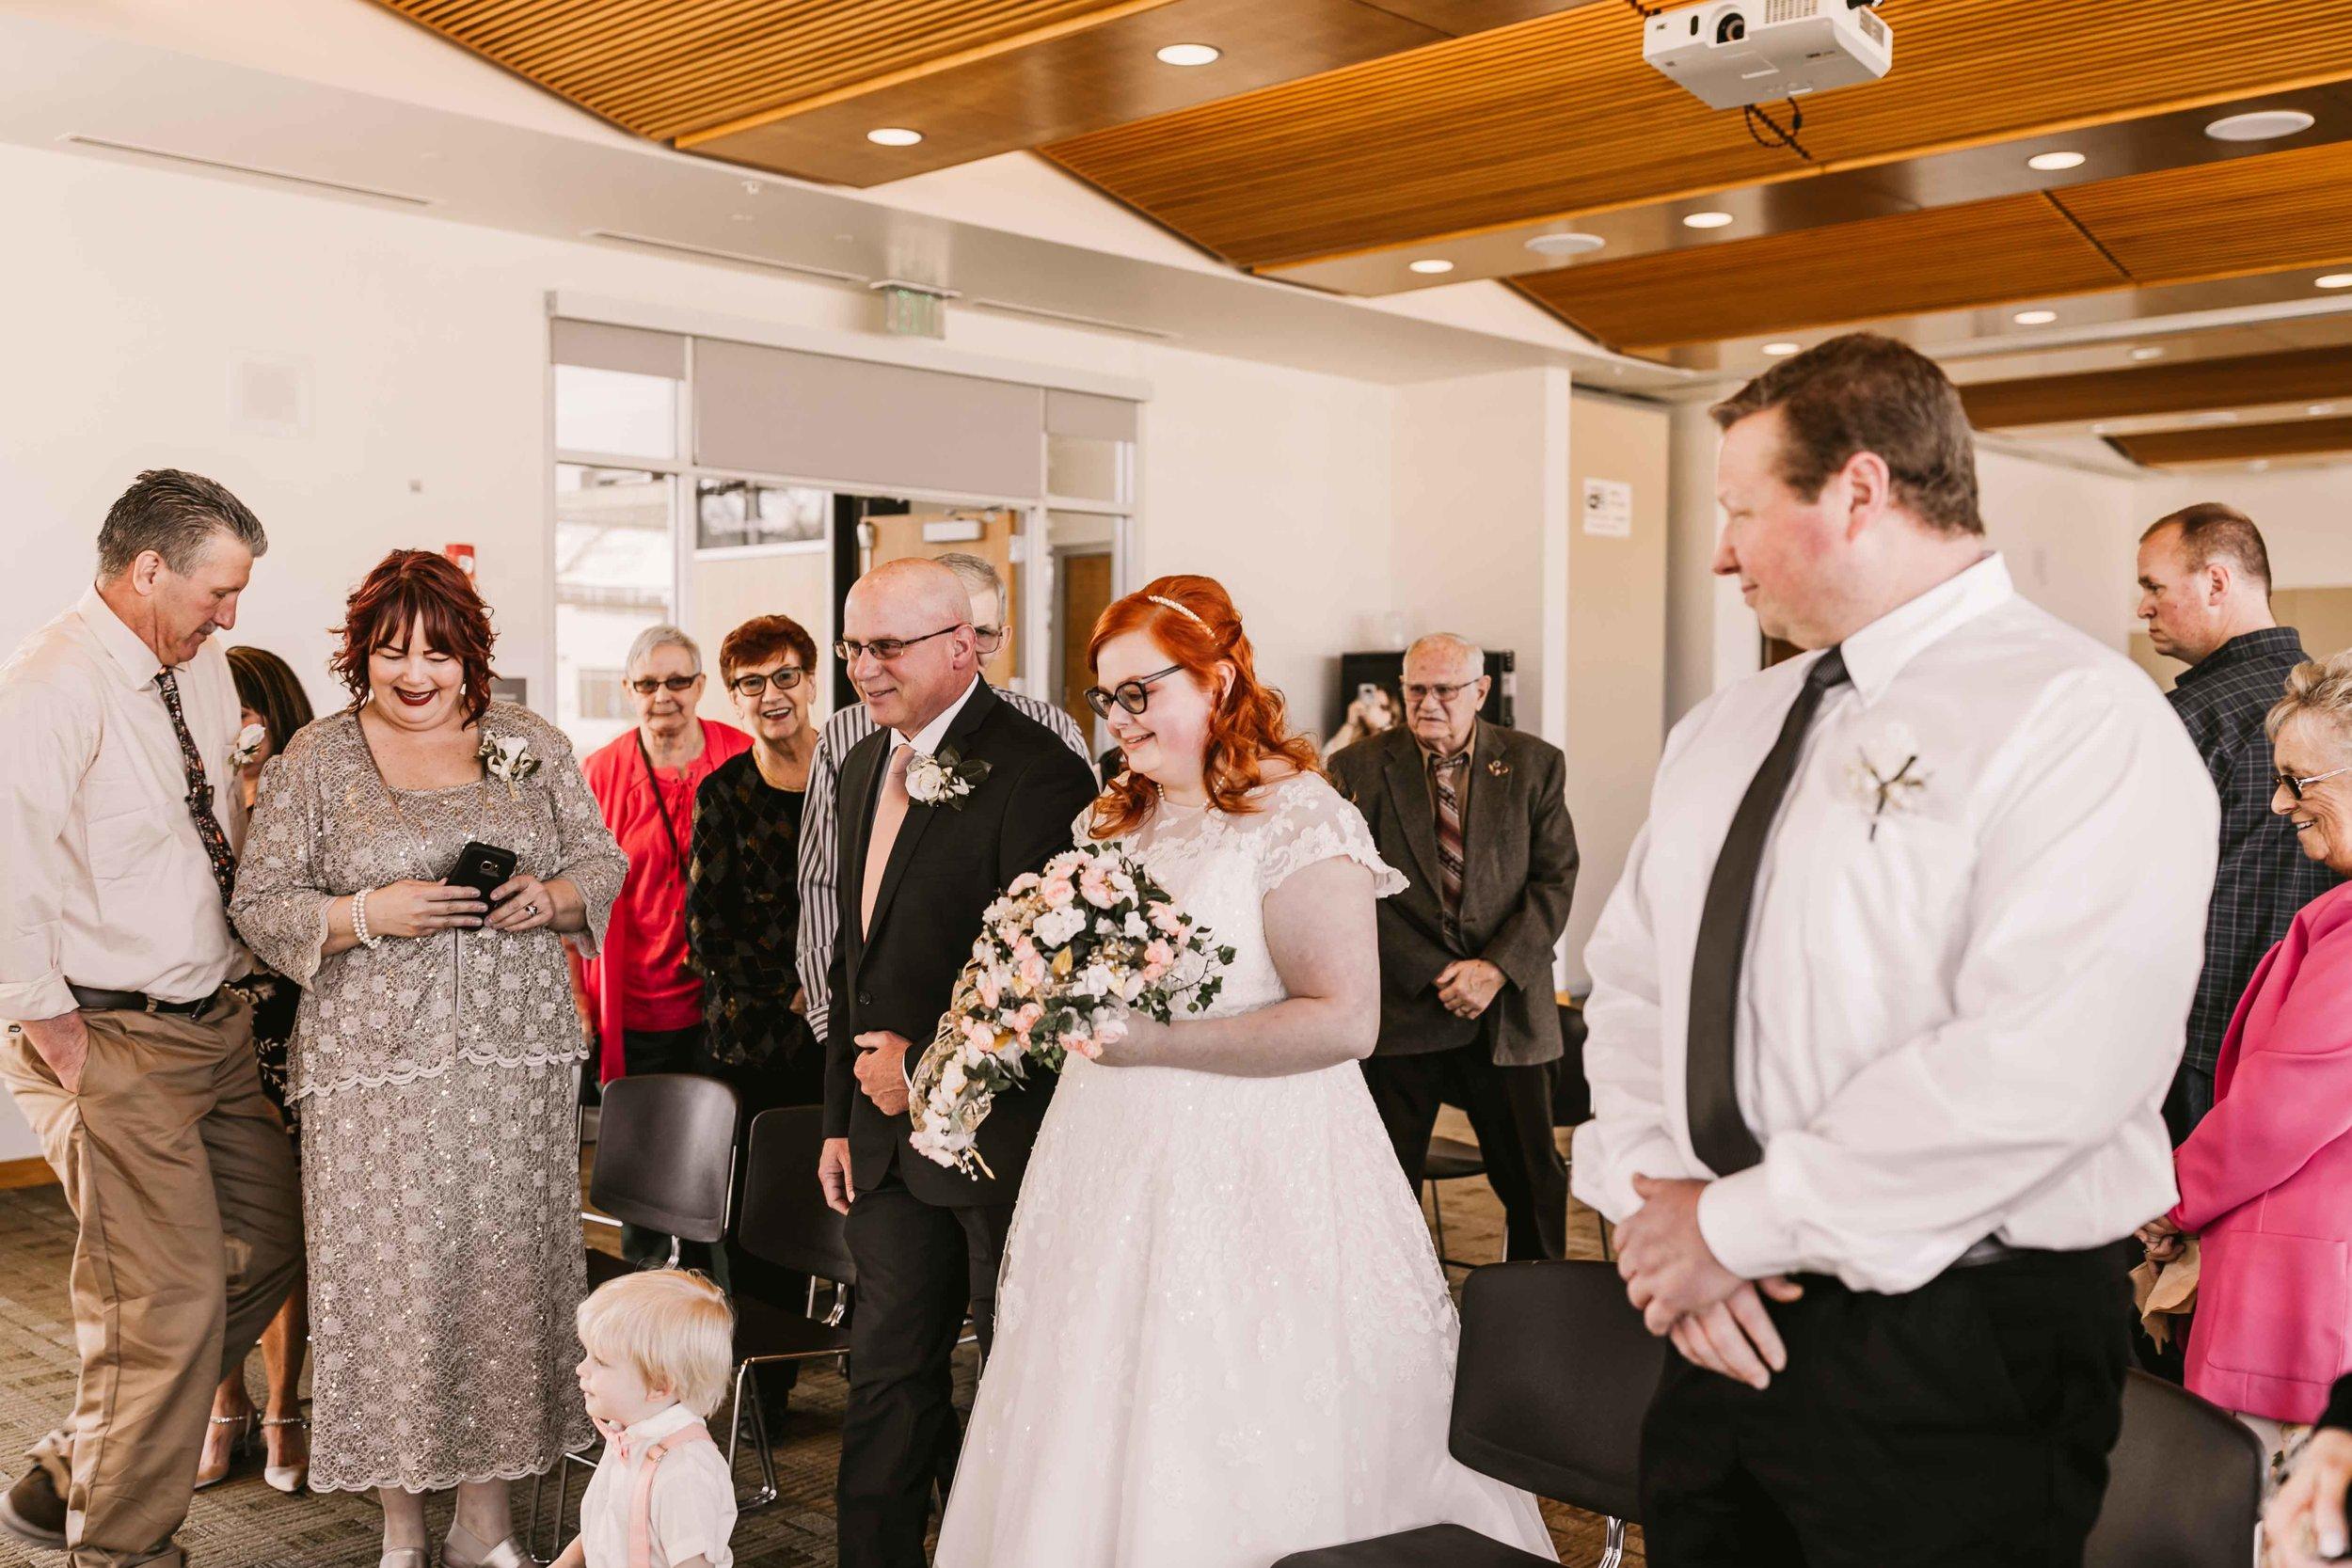 richland-wedding-photographer-18.jpg